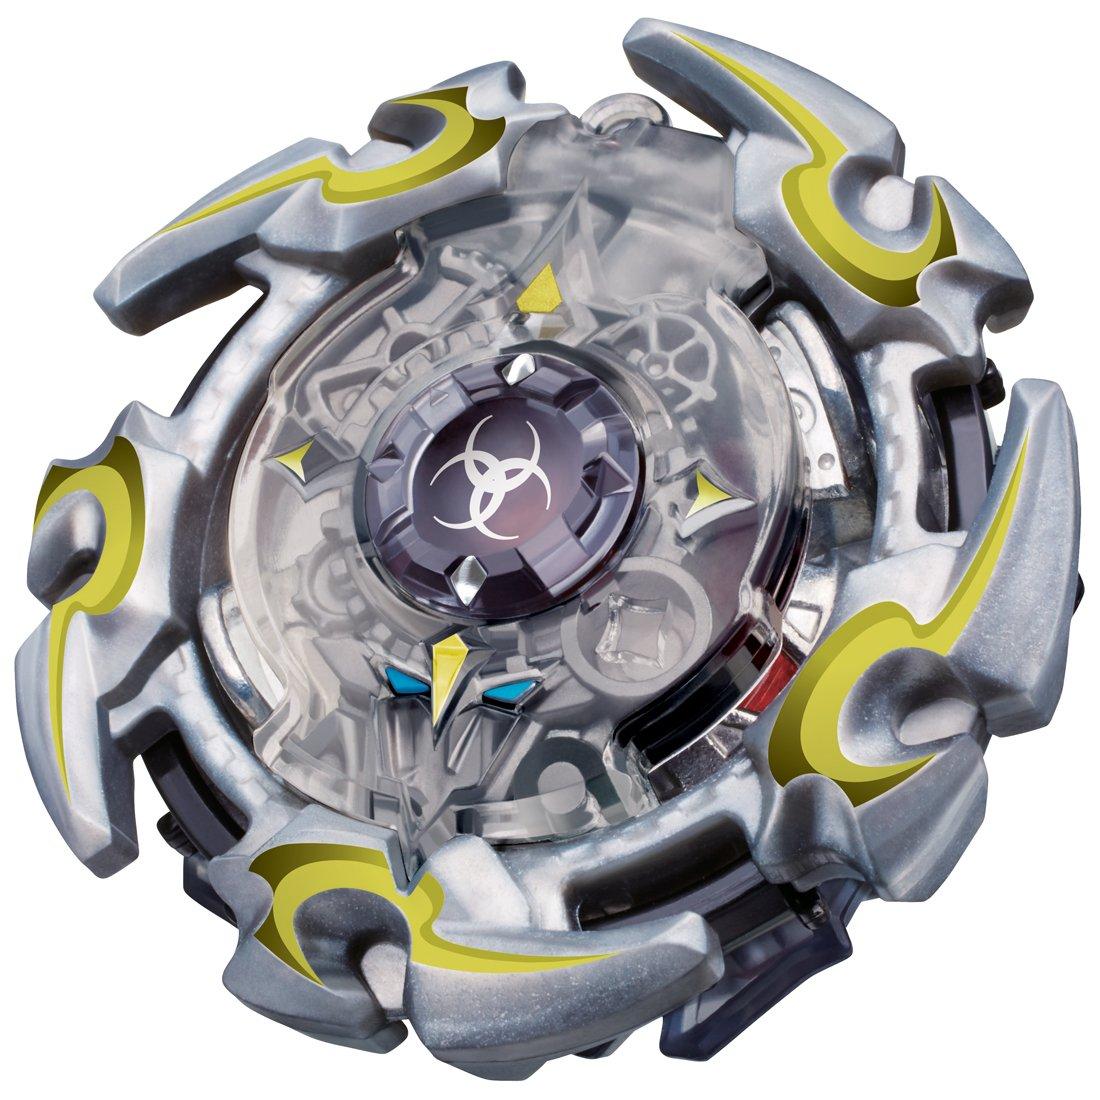 Takaratomy Beyblade Burst B-82 Booster Alter Chronos.6M.T God Layer System JVG INC. - CA